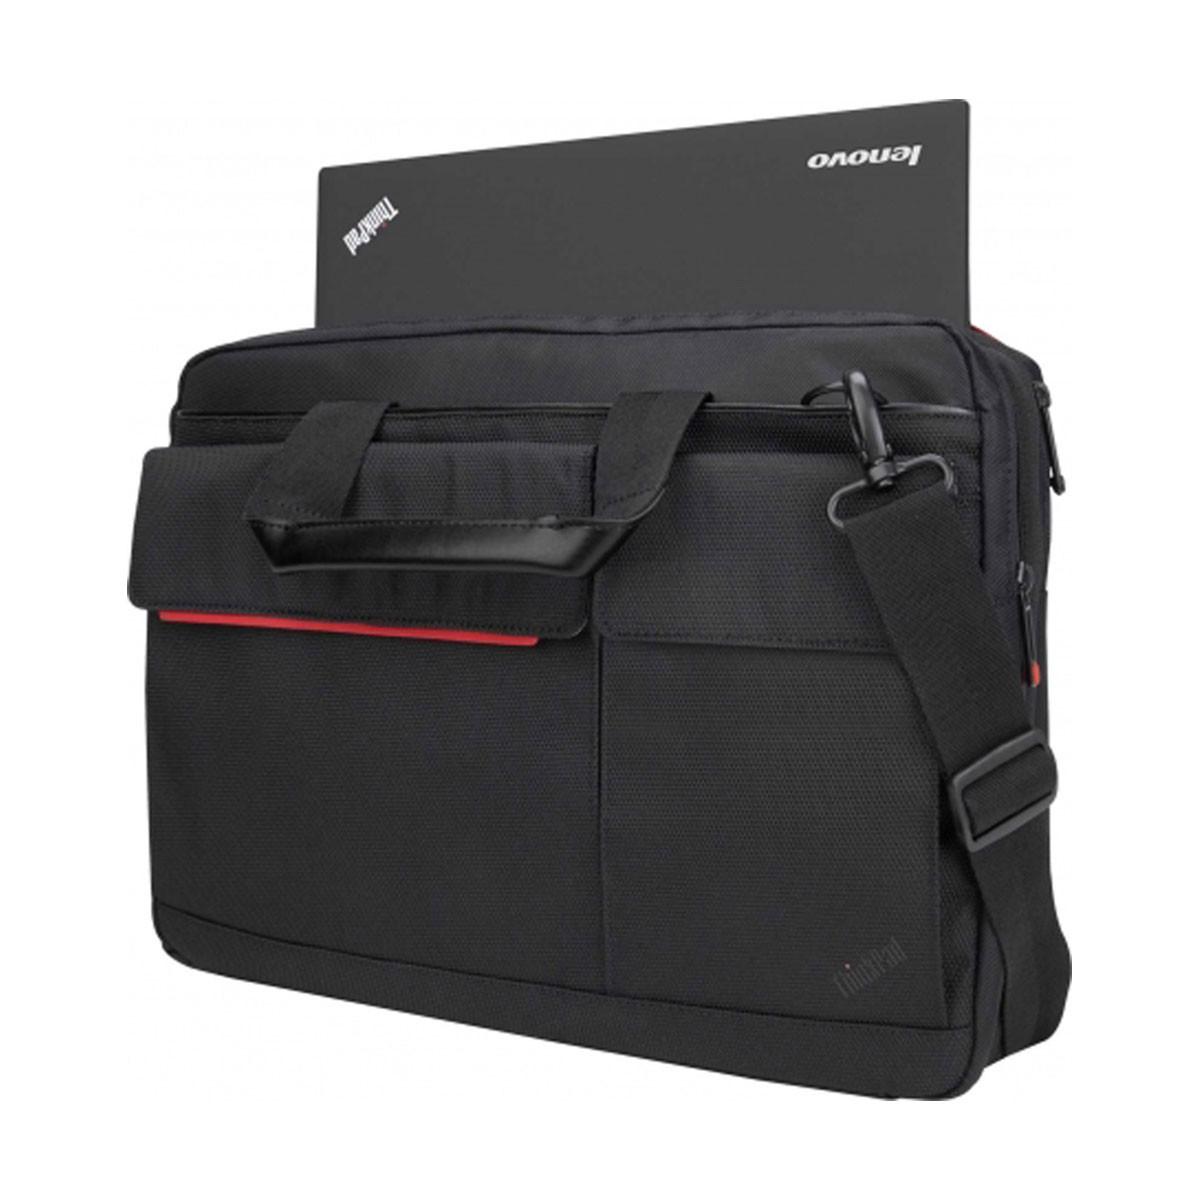 (EOL) Lenovo™ ThinkPad® Professional Slim Topload-Tasche